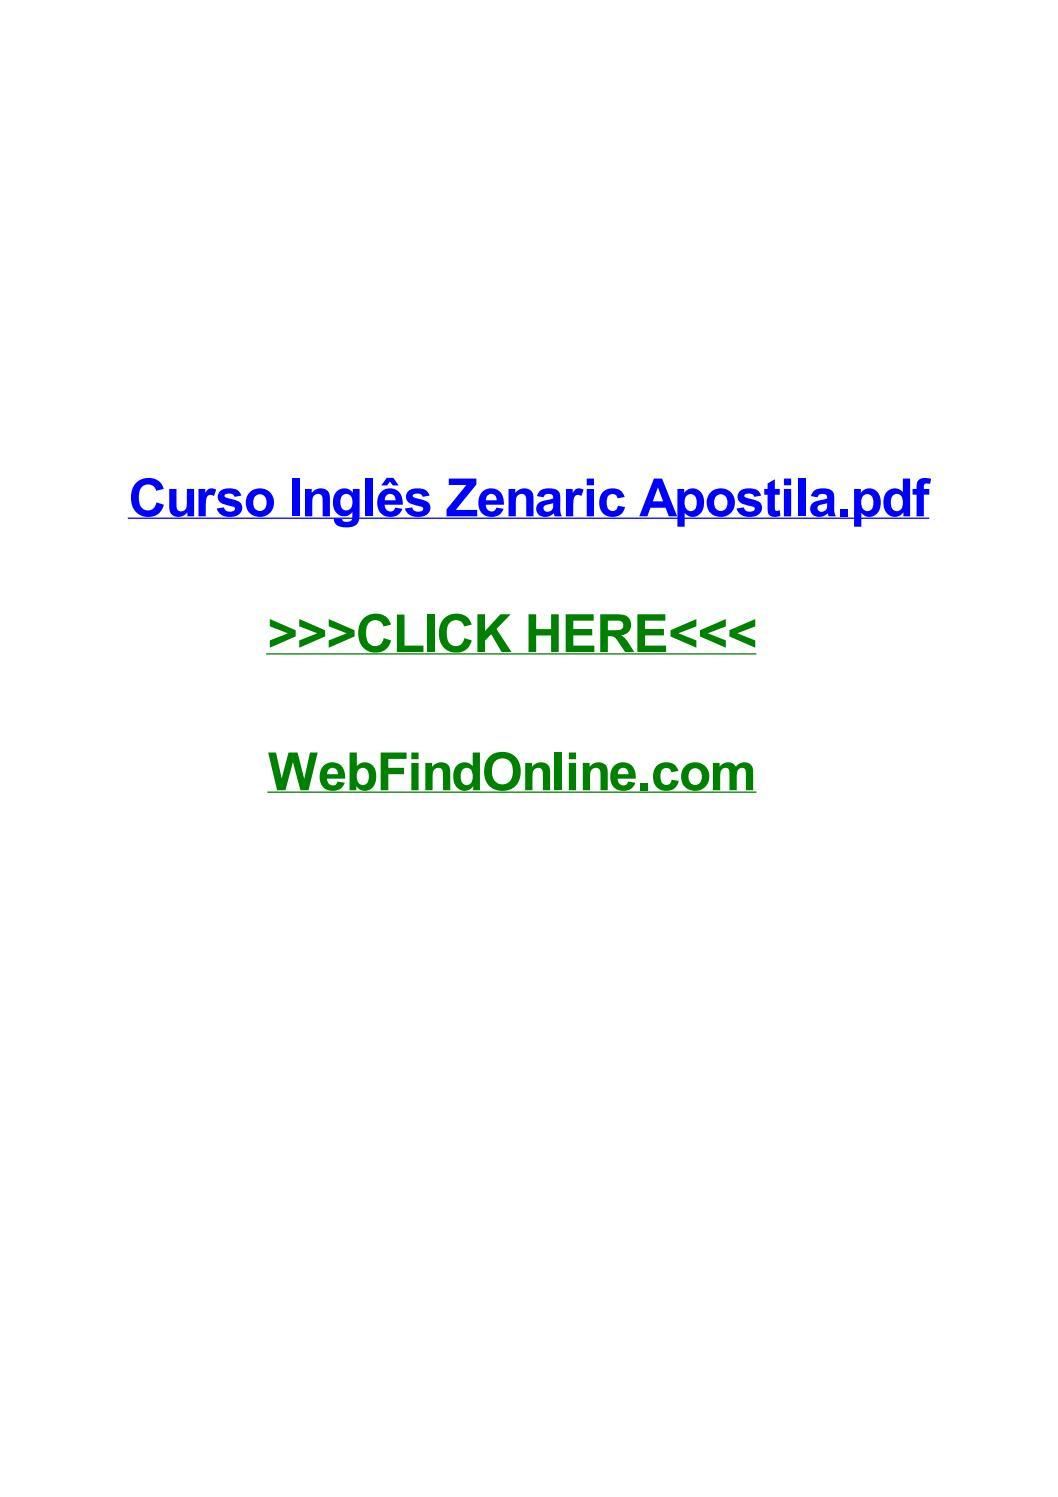 Curso inglгєs zenaric apostila pdf by monicapjqkd issuu.